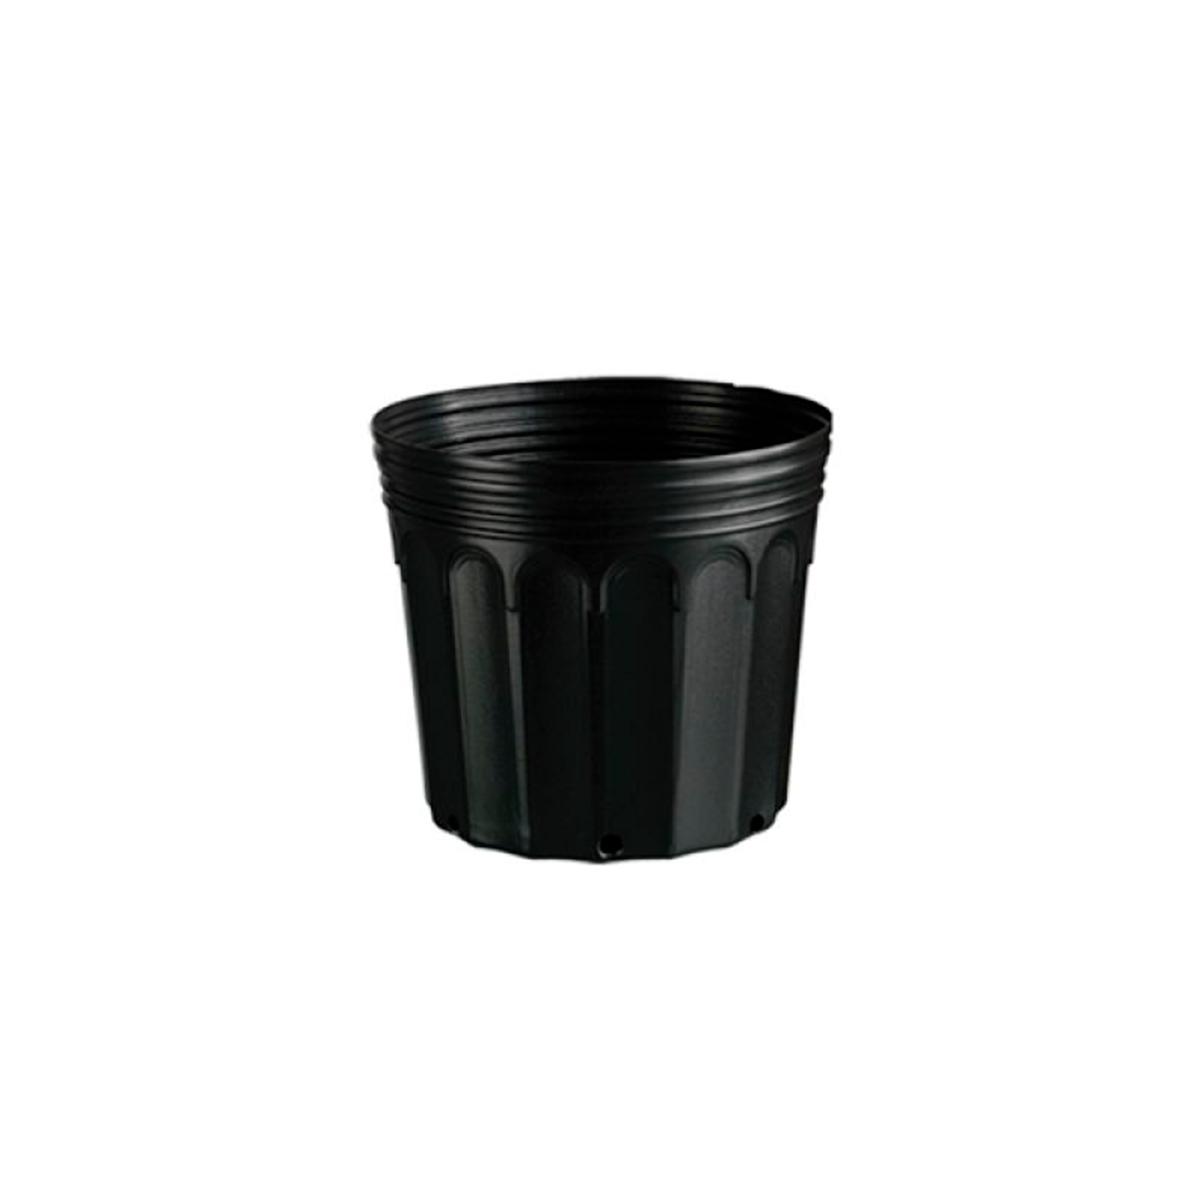 Kit 15 Embalagem Vaso para Mudas Plástico 3,6L